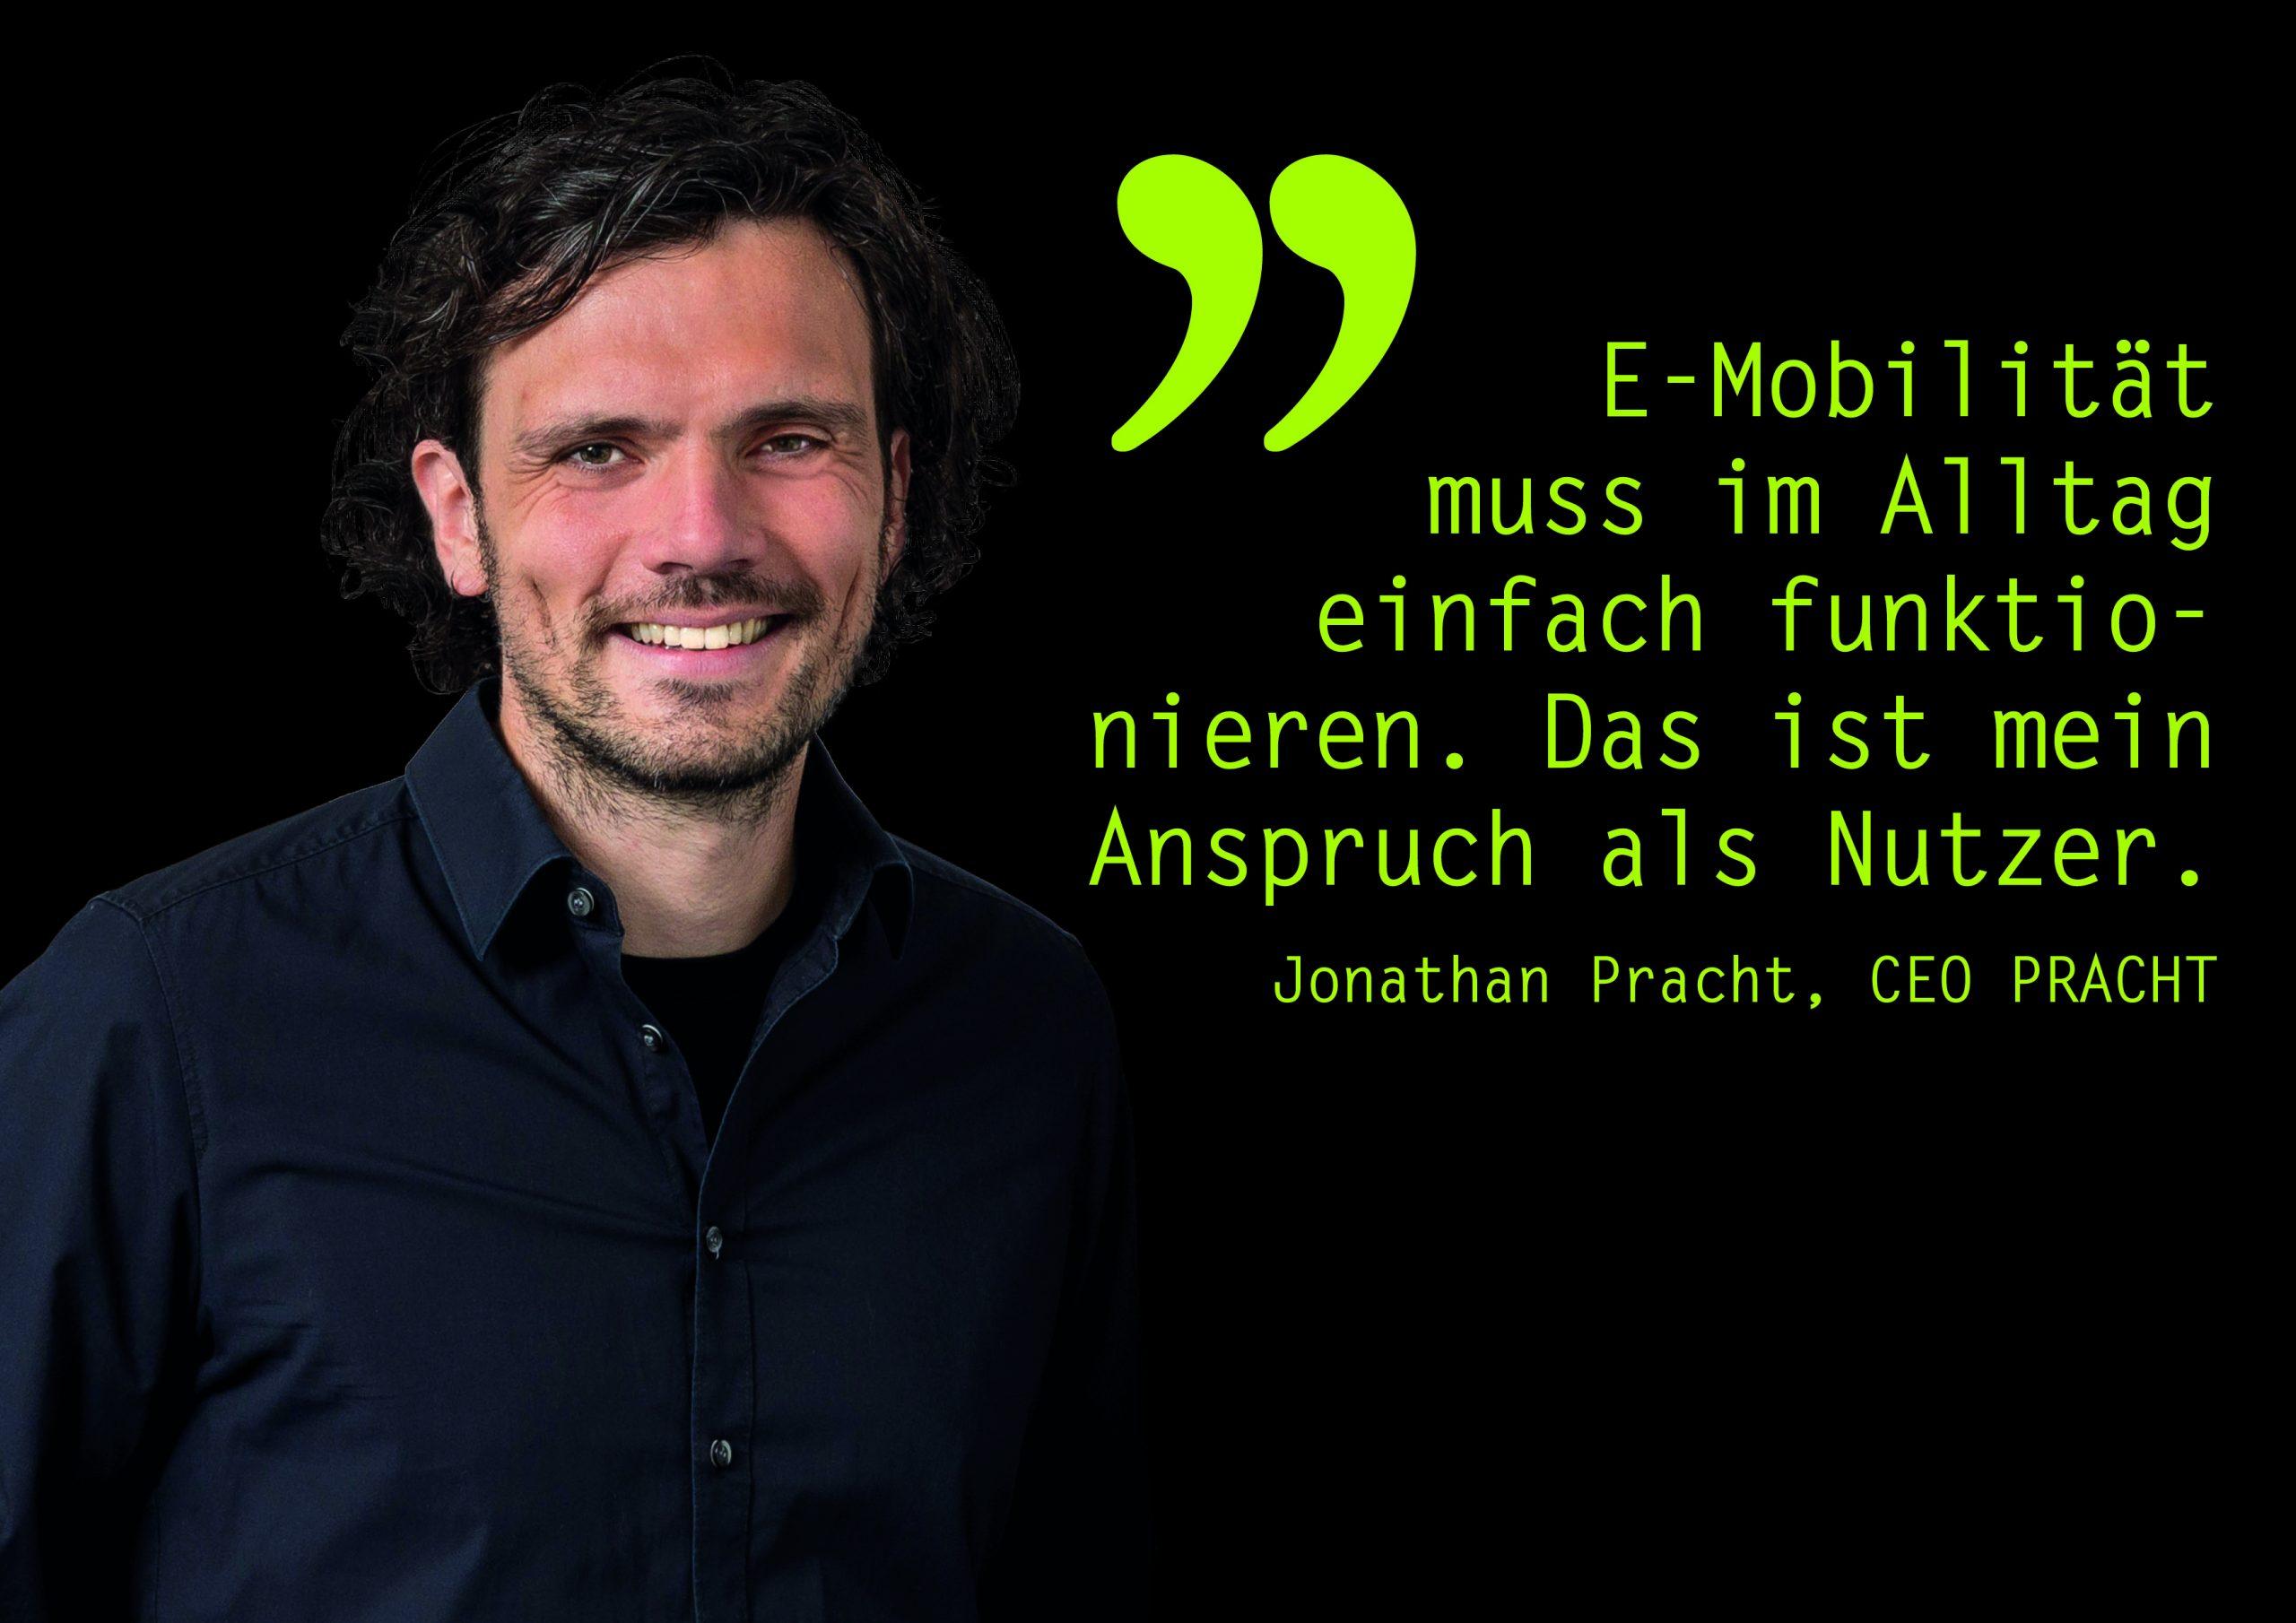 Jonathan Pracht